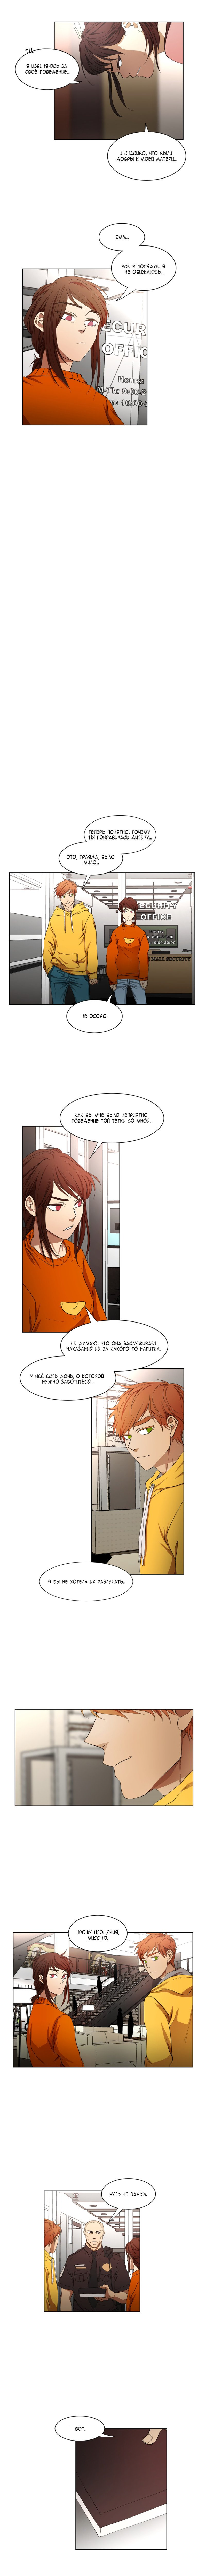 Манга Я люблю Ю / I love Yoo  - Том 1 Глава 18 Страница 10